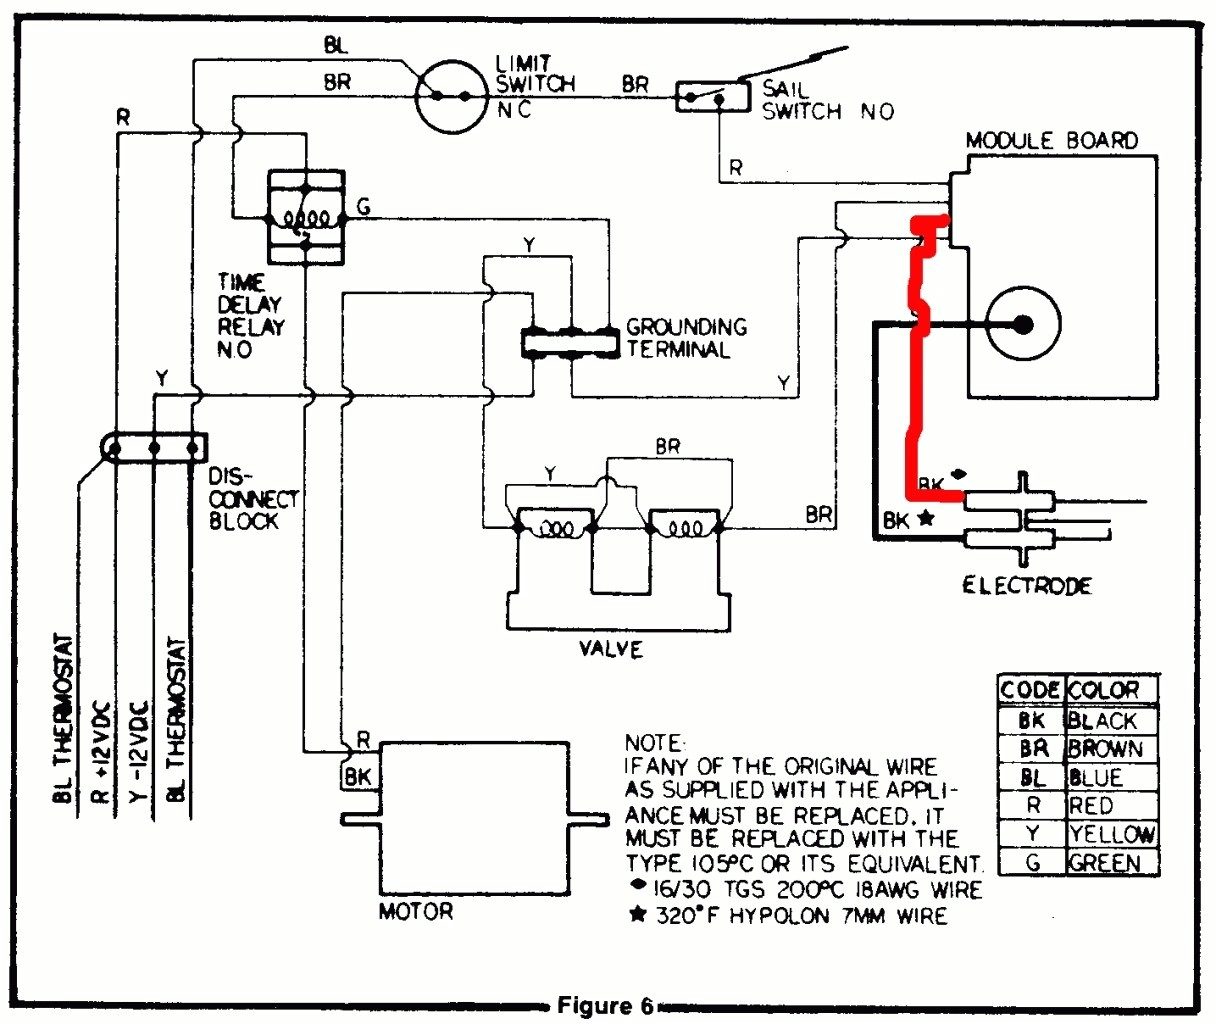 rv furnace wiring diagram data diagram schematic rv furnace wiring rv furnace wiring